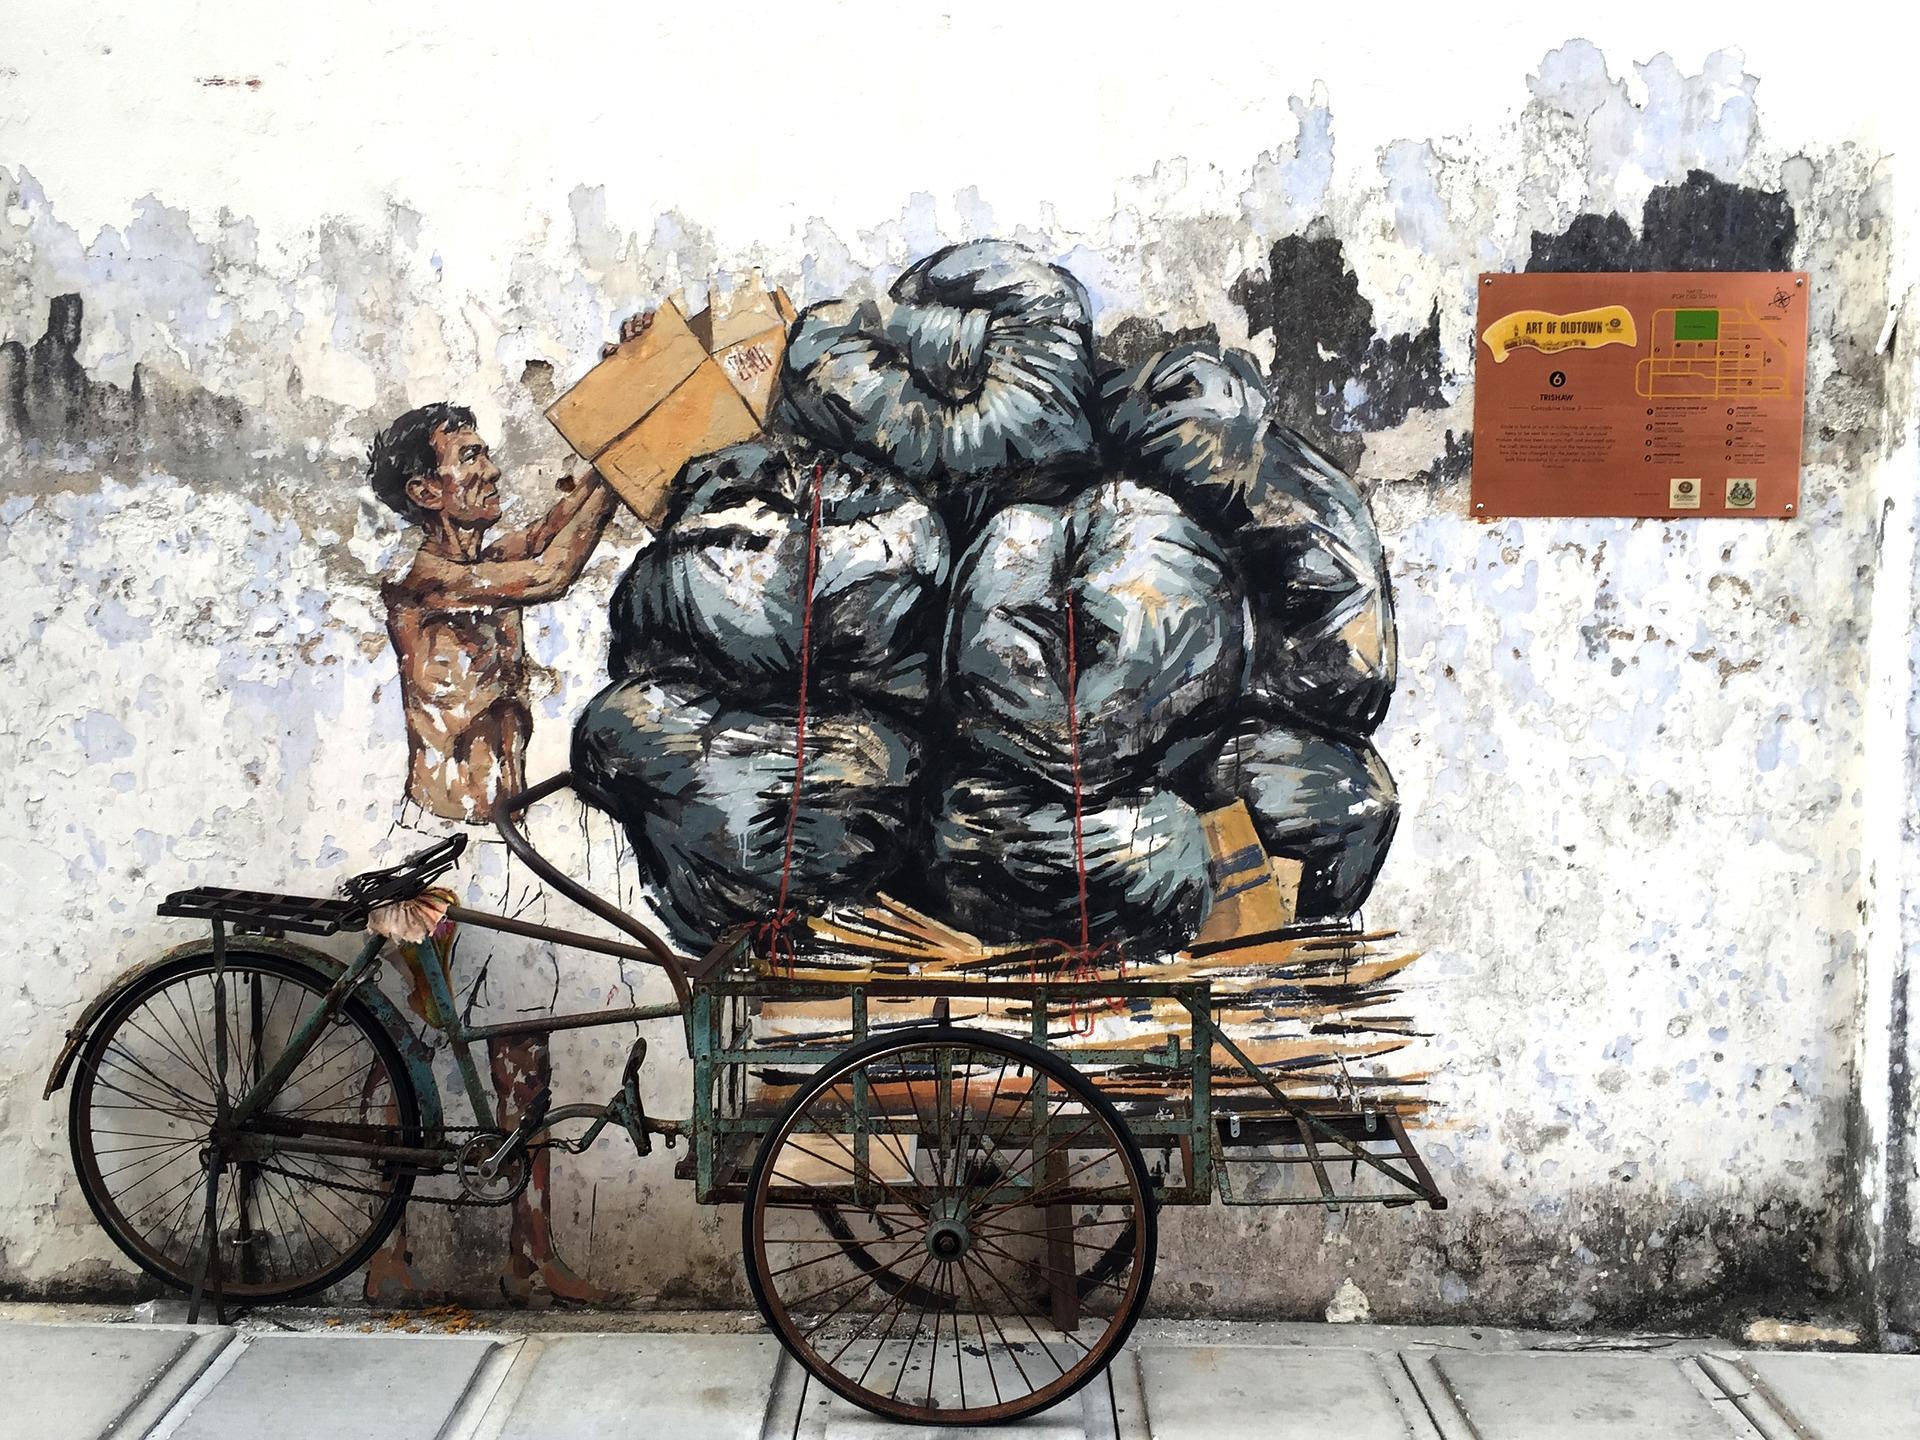 Street-Art-Ipoh-Itinerary-Malaysia.jpg